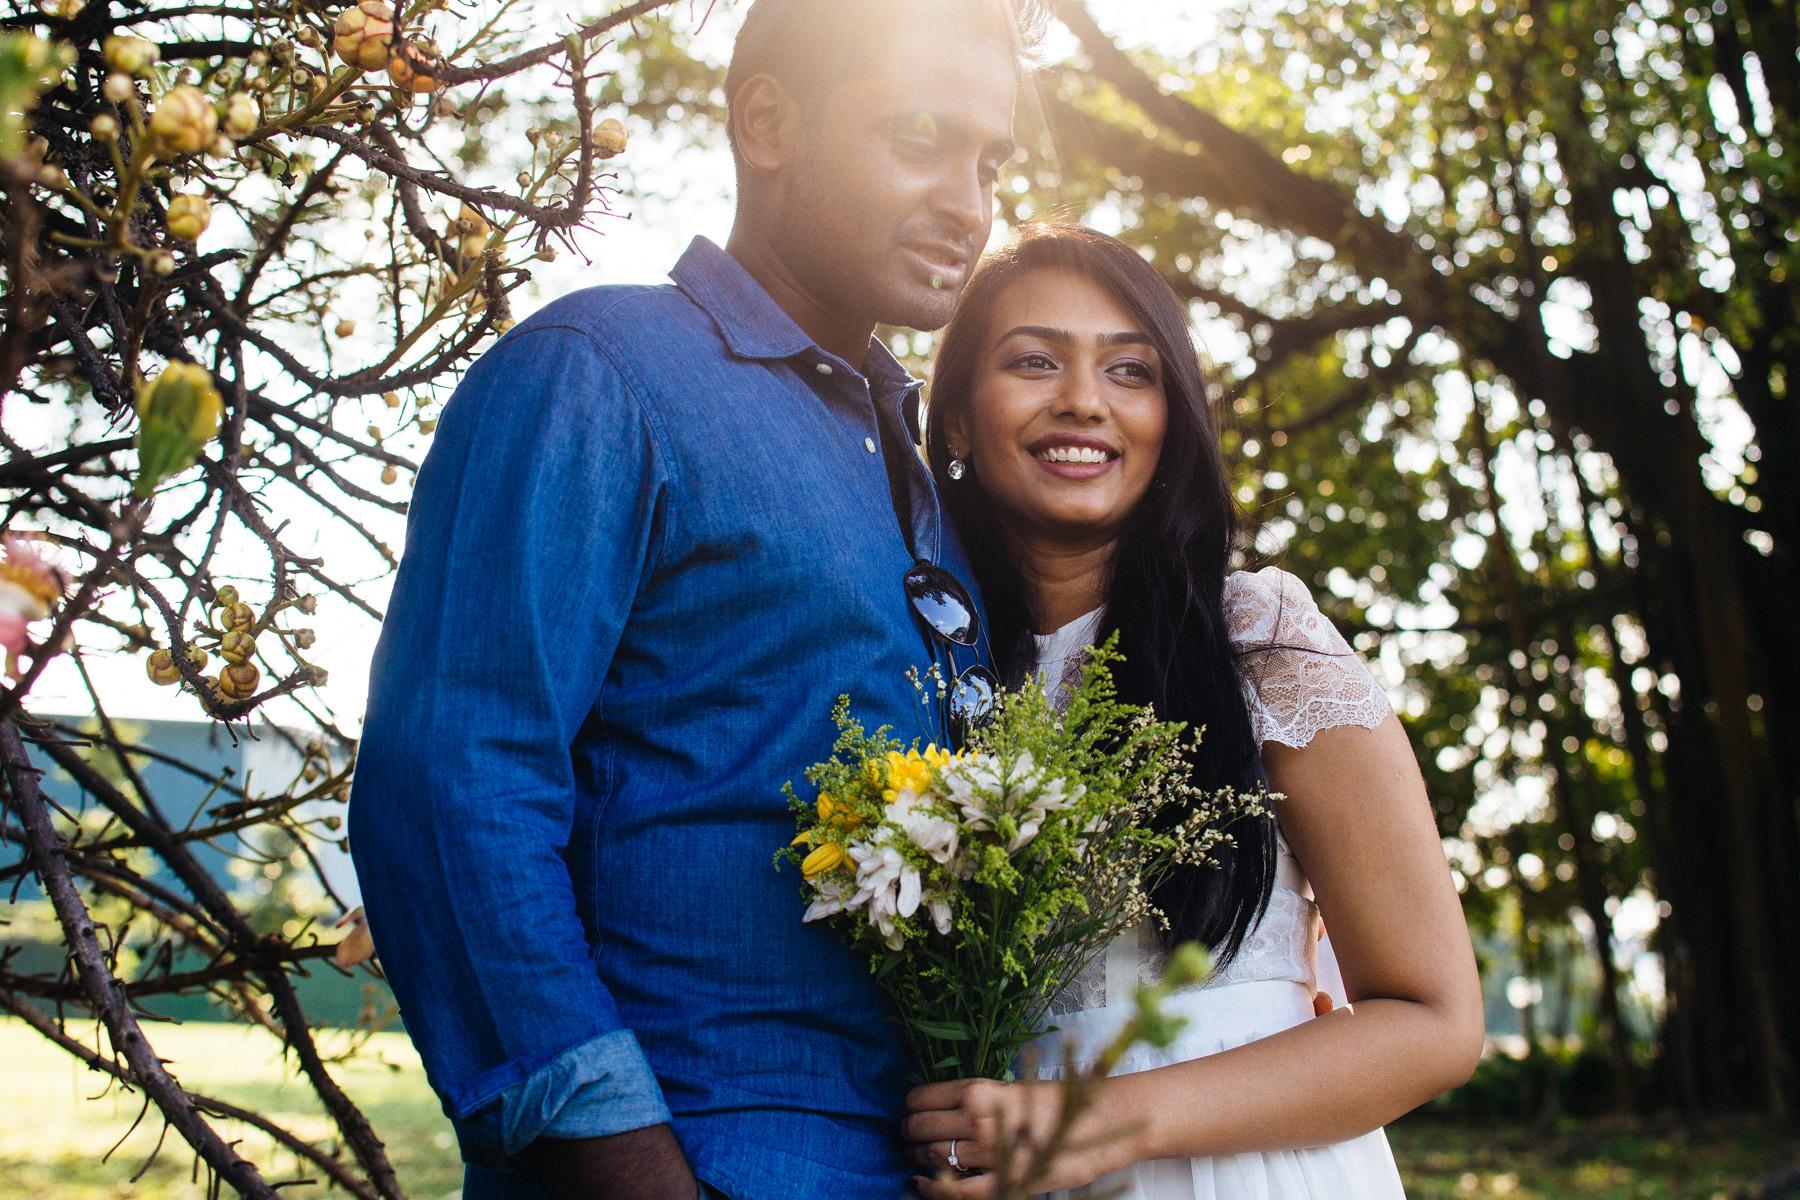 singapore-wedding-travel-photographer-abigail-caleb-wedding-wmt-04.jpg